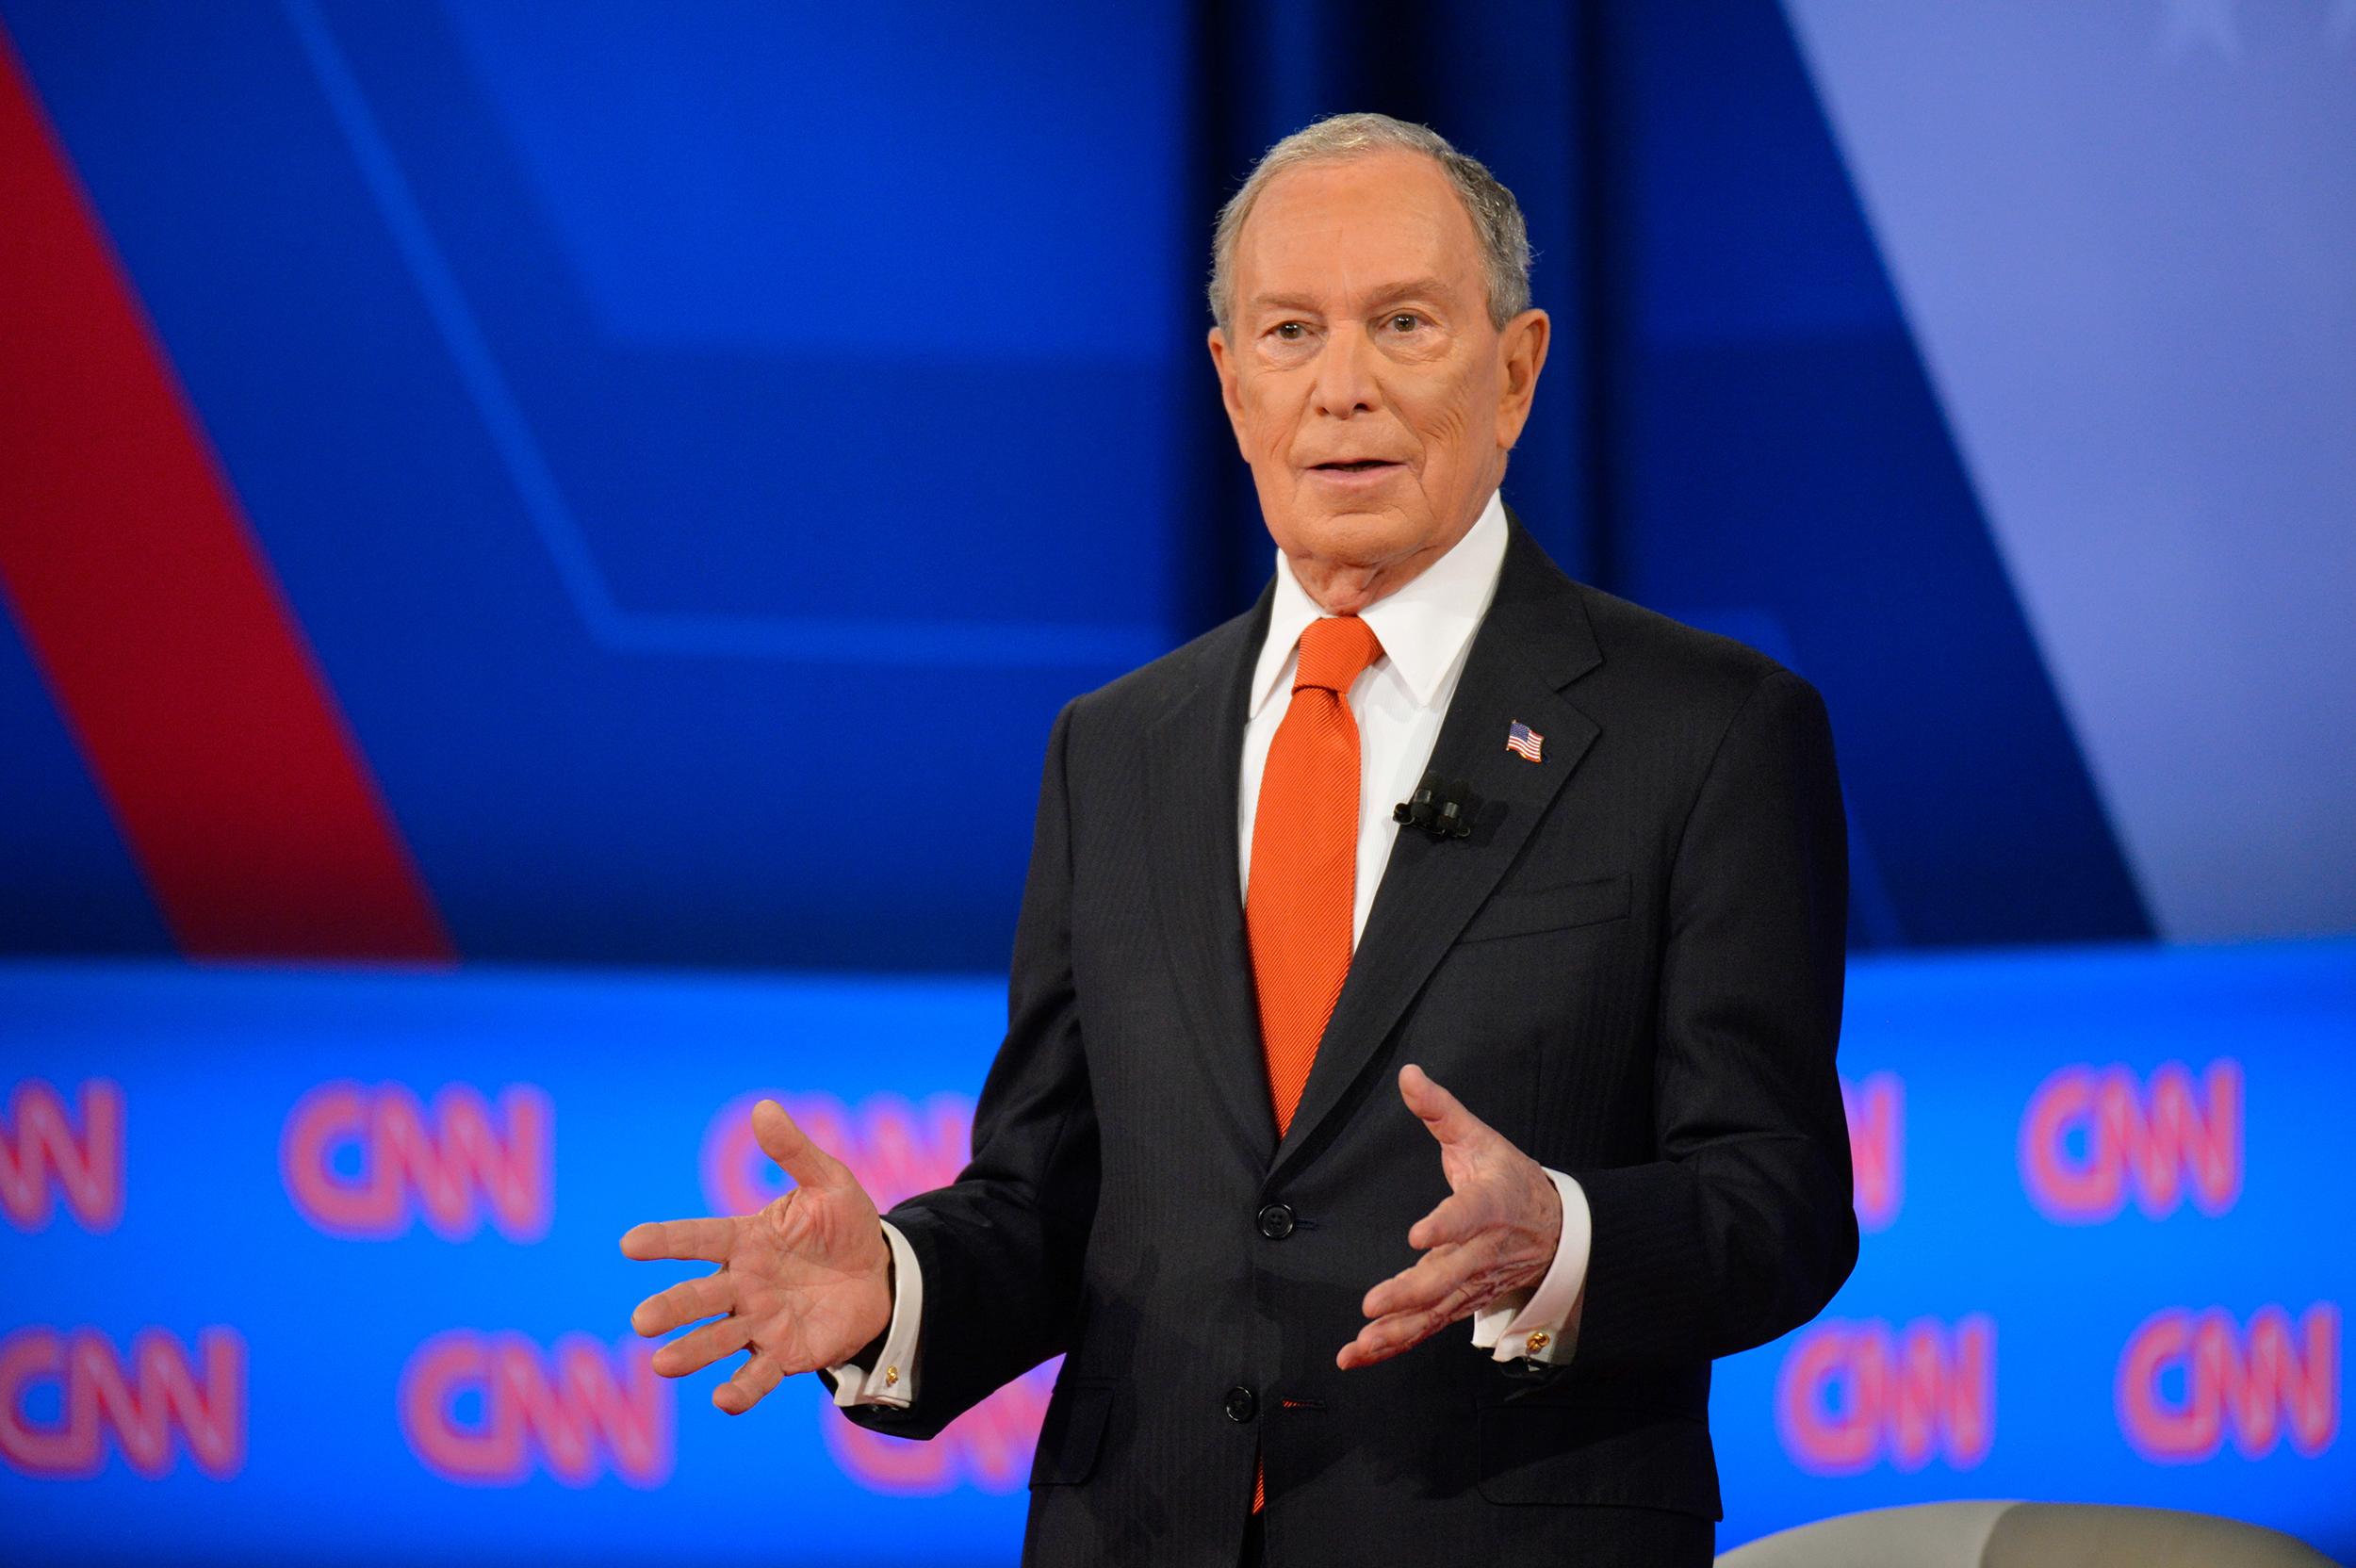 Ad spending barrels past $1 billion mark as Mike Bloomberg overwhelms airwaves